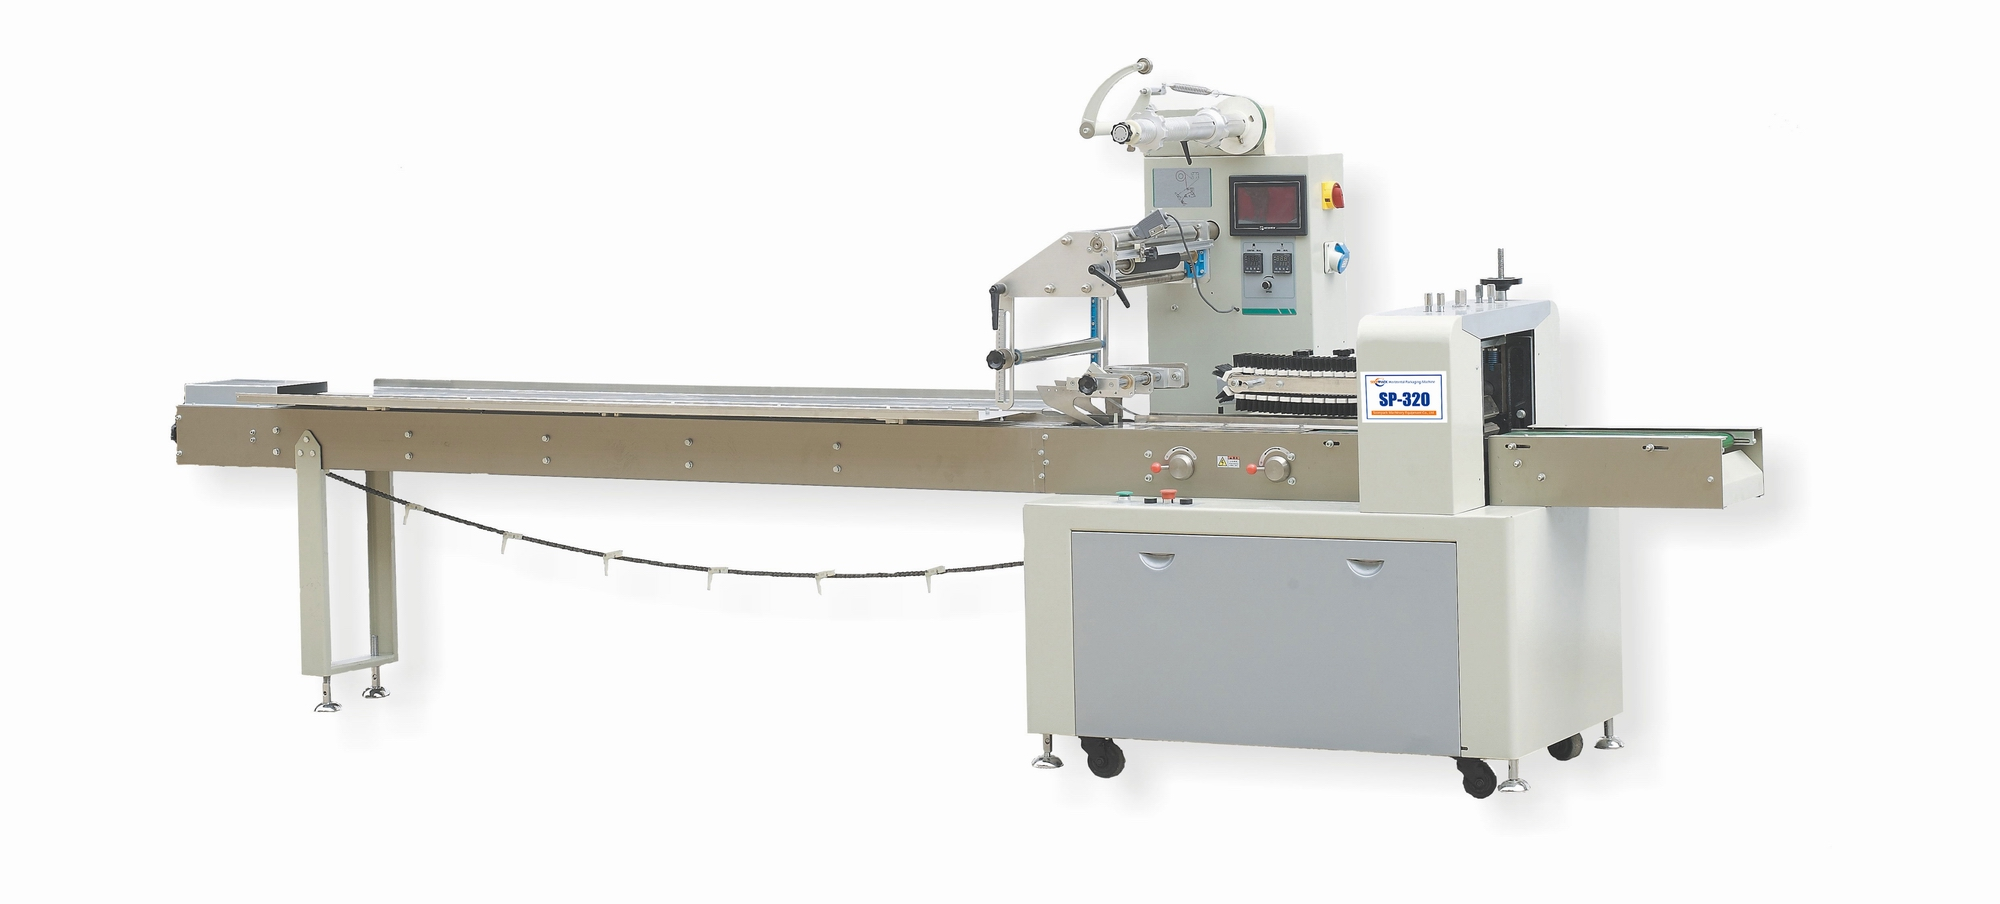 SP320 flow pack machine